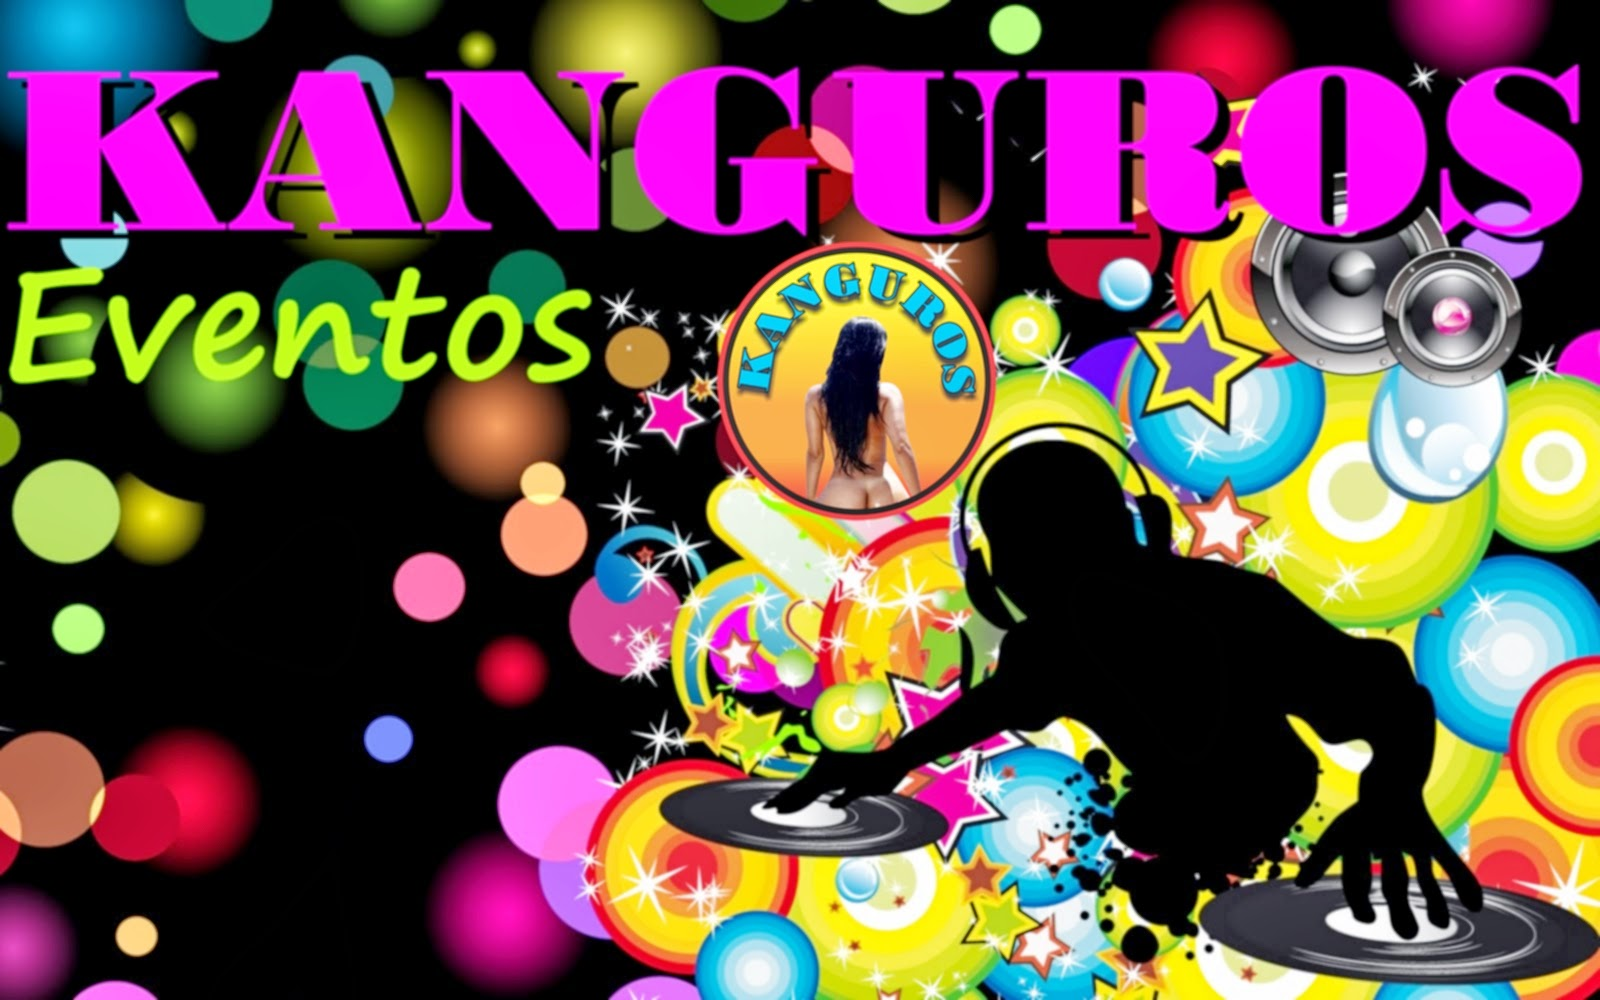 CLUB DE AMIGOS SWINGER KANGUROS BUCARAMANGA!